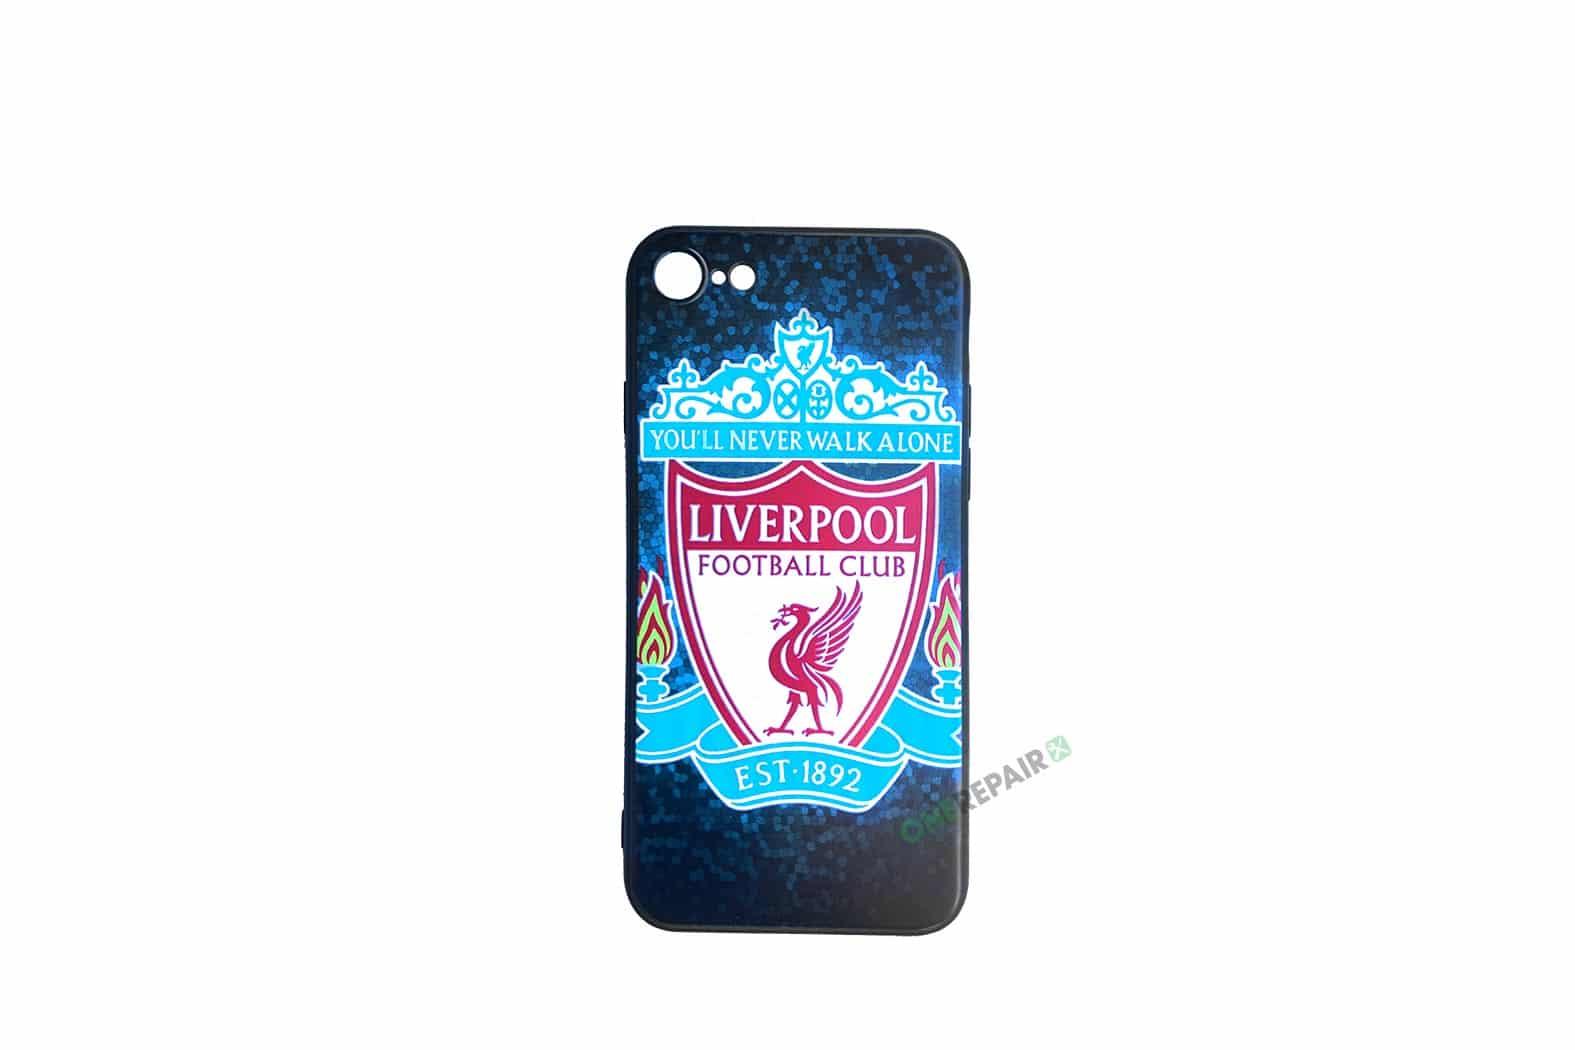 350765_iPhone_78_Fodbold_Liverpool_dark_Cover_OneRepair_00001